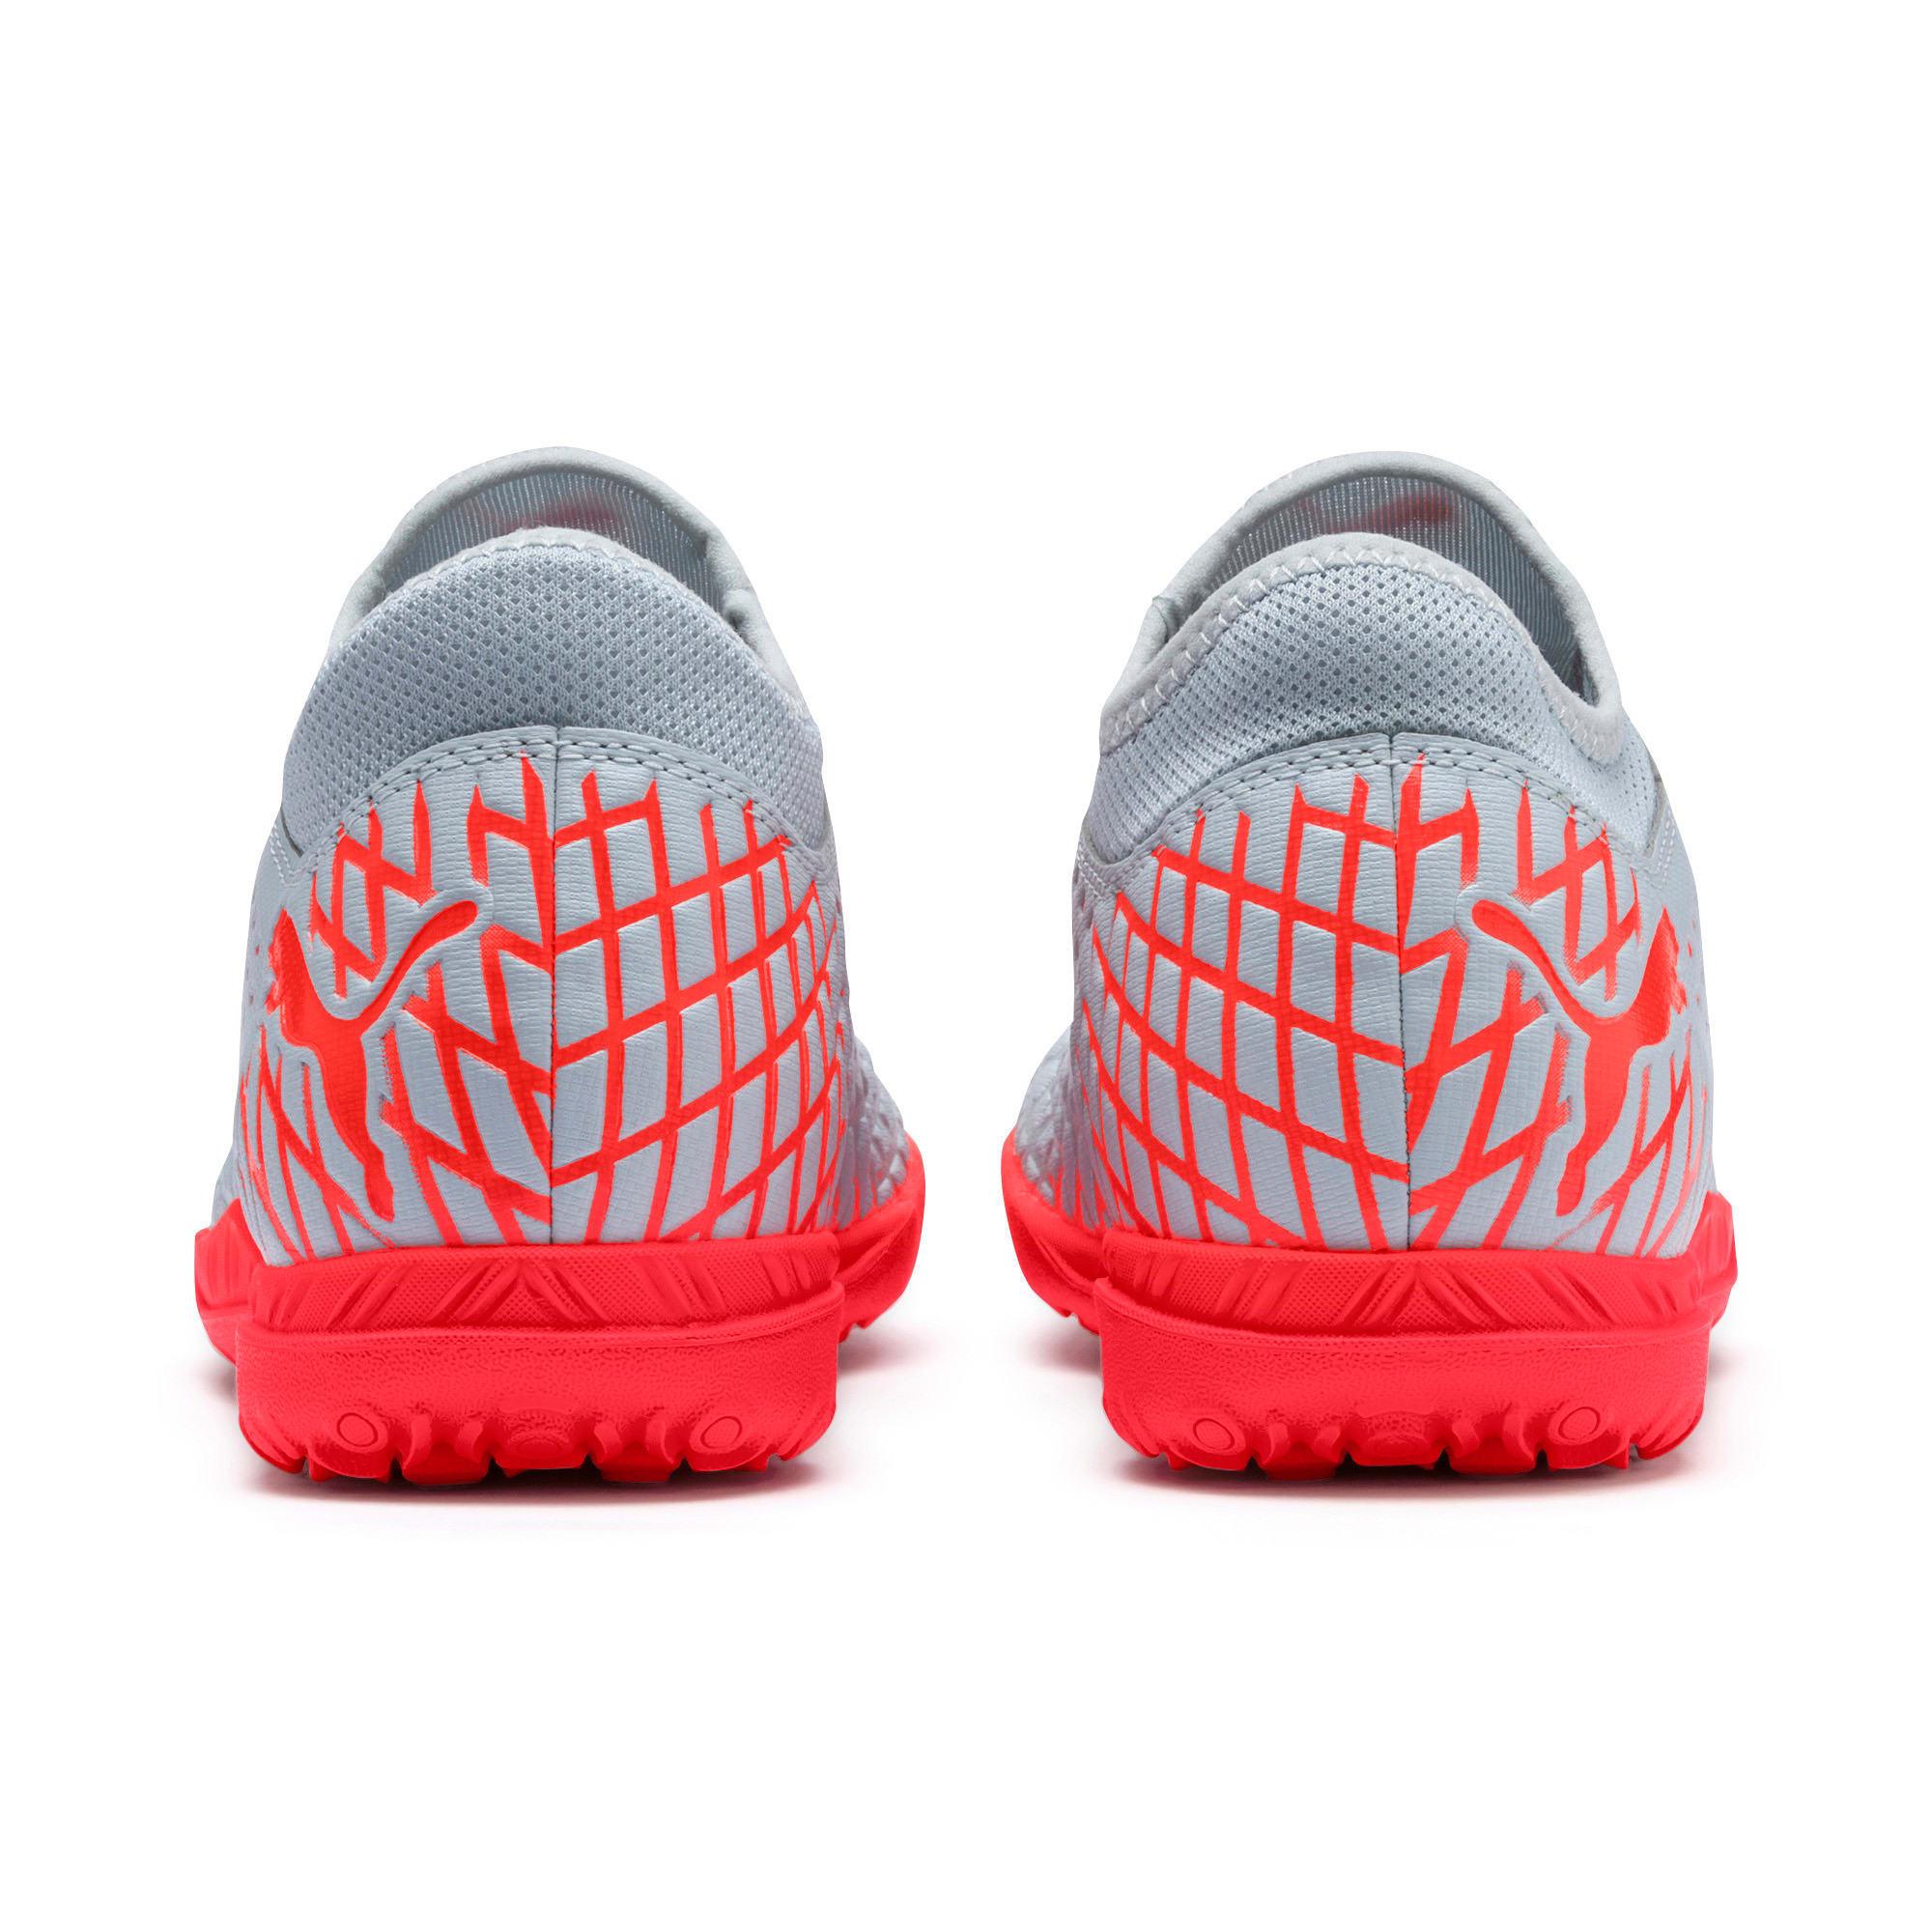 Thumbnail 4 of FUTURE 4.4 TT Men's Soccer Shoes, Glacial Blue-Nrgy Red, medium